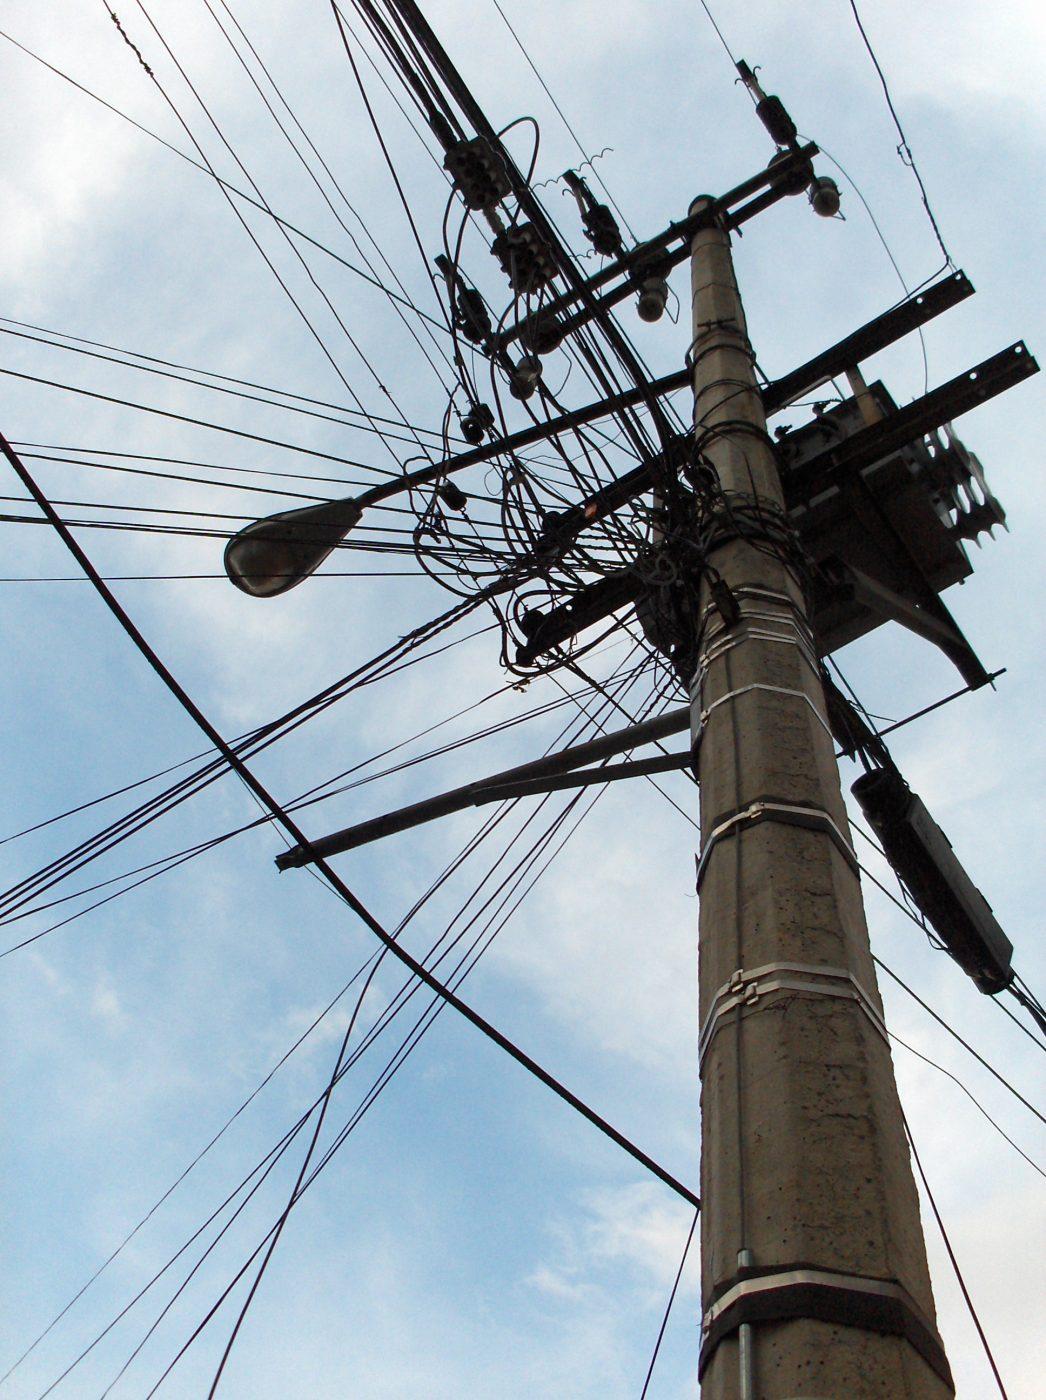 electric-power-1447084 by Karina Cabrera